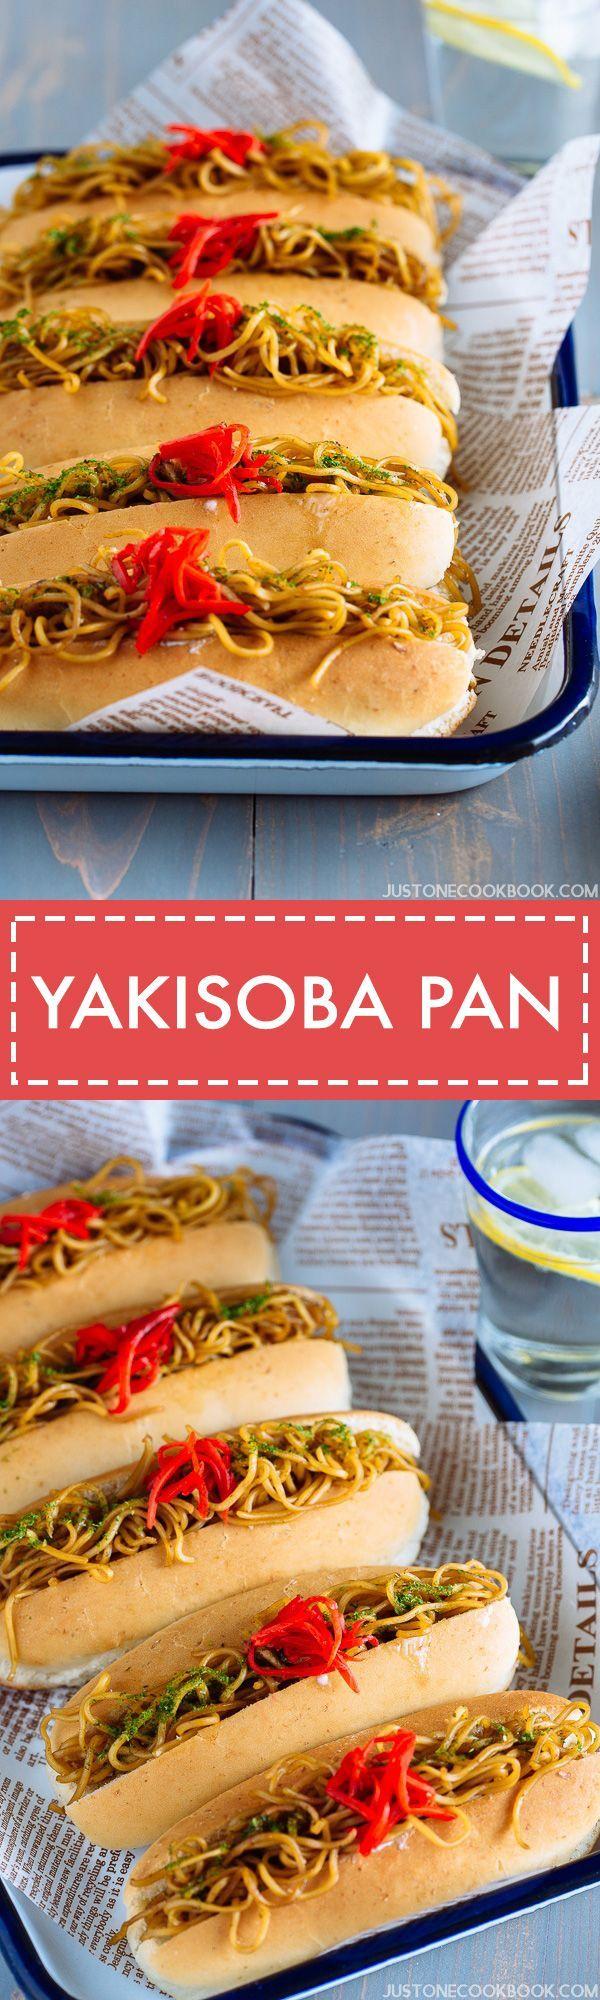 Yakisoba Pan 焼きそばパン | Easy Japanese Recipes at JustOneCookbook.com